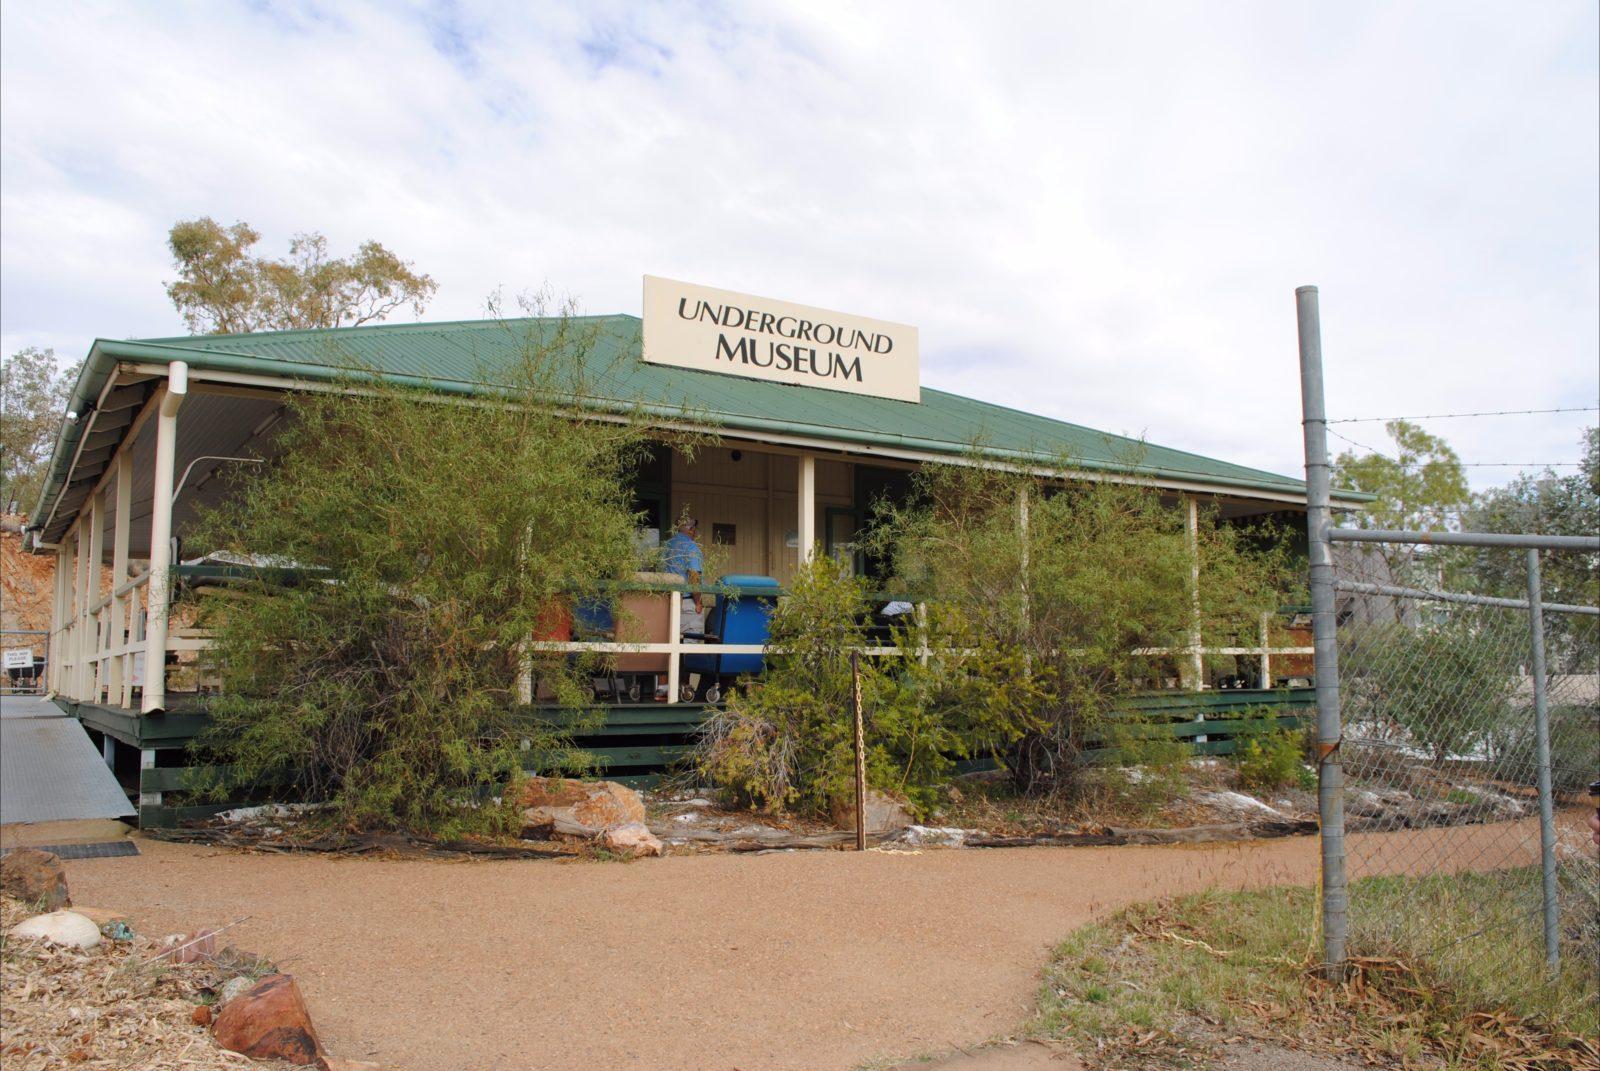 Mount Isa Underground Hospital and Museum